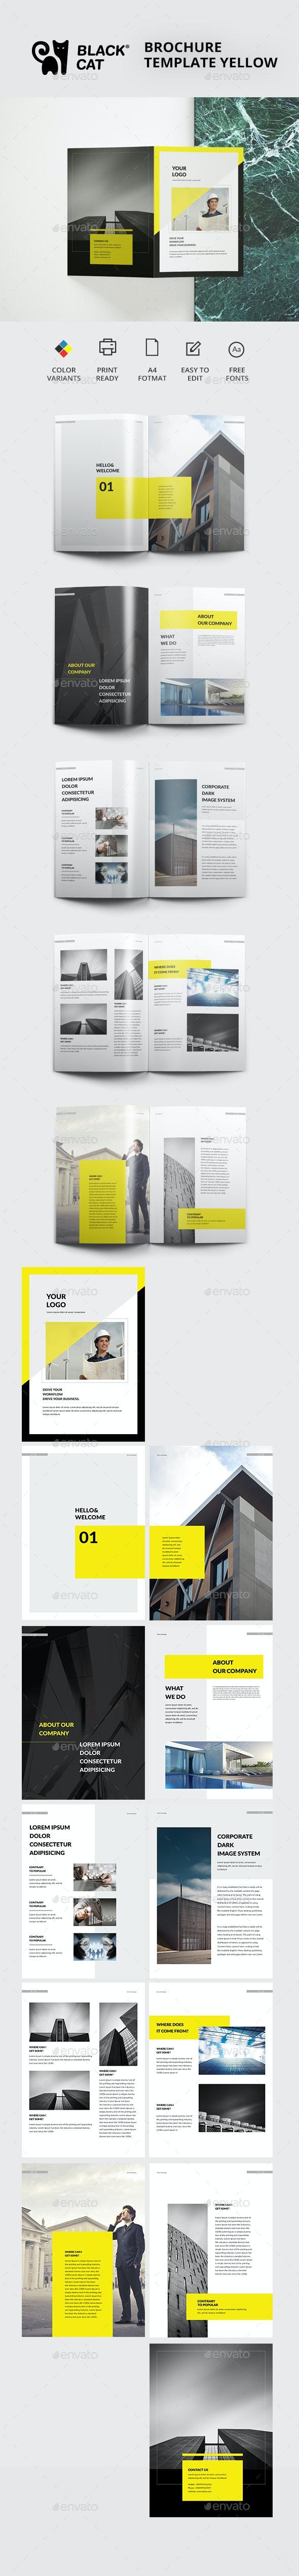 Brochure Template Yellow - Brochures Print Templates